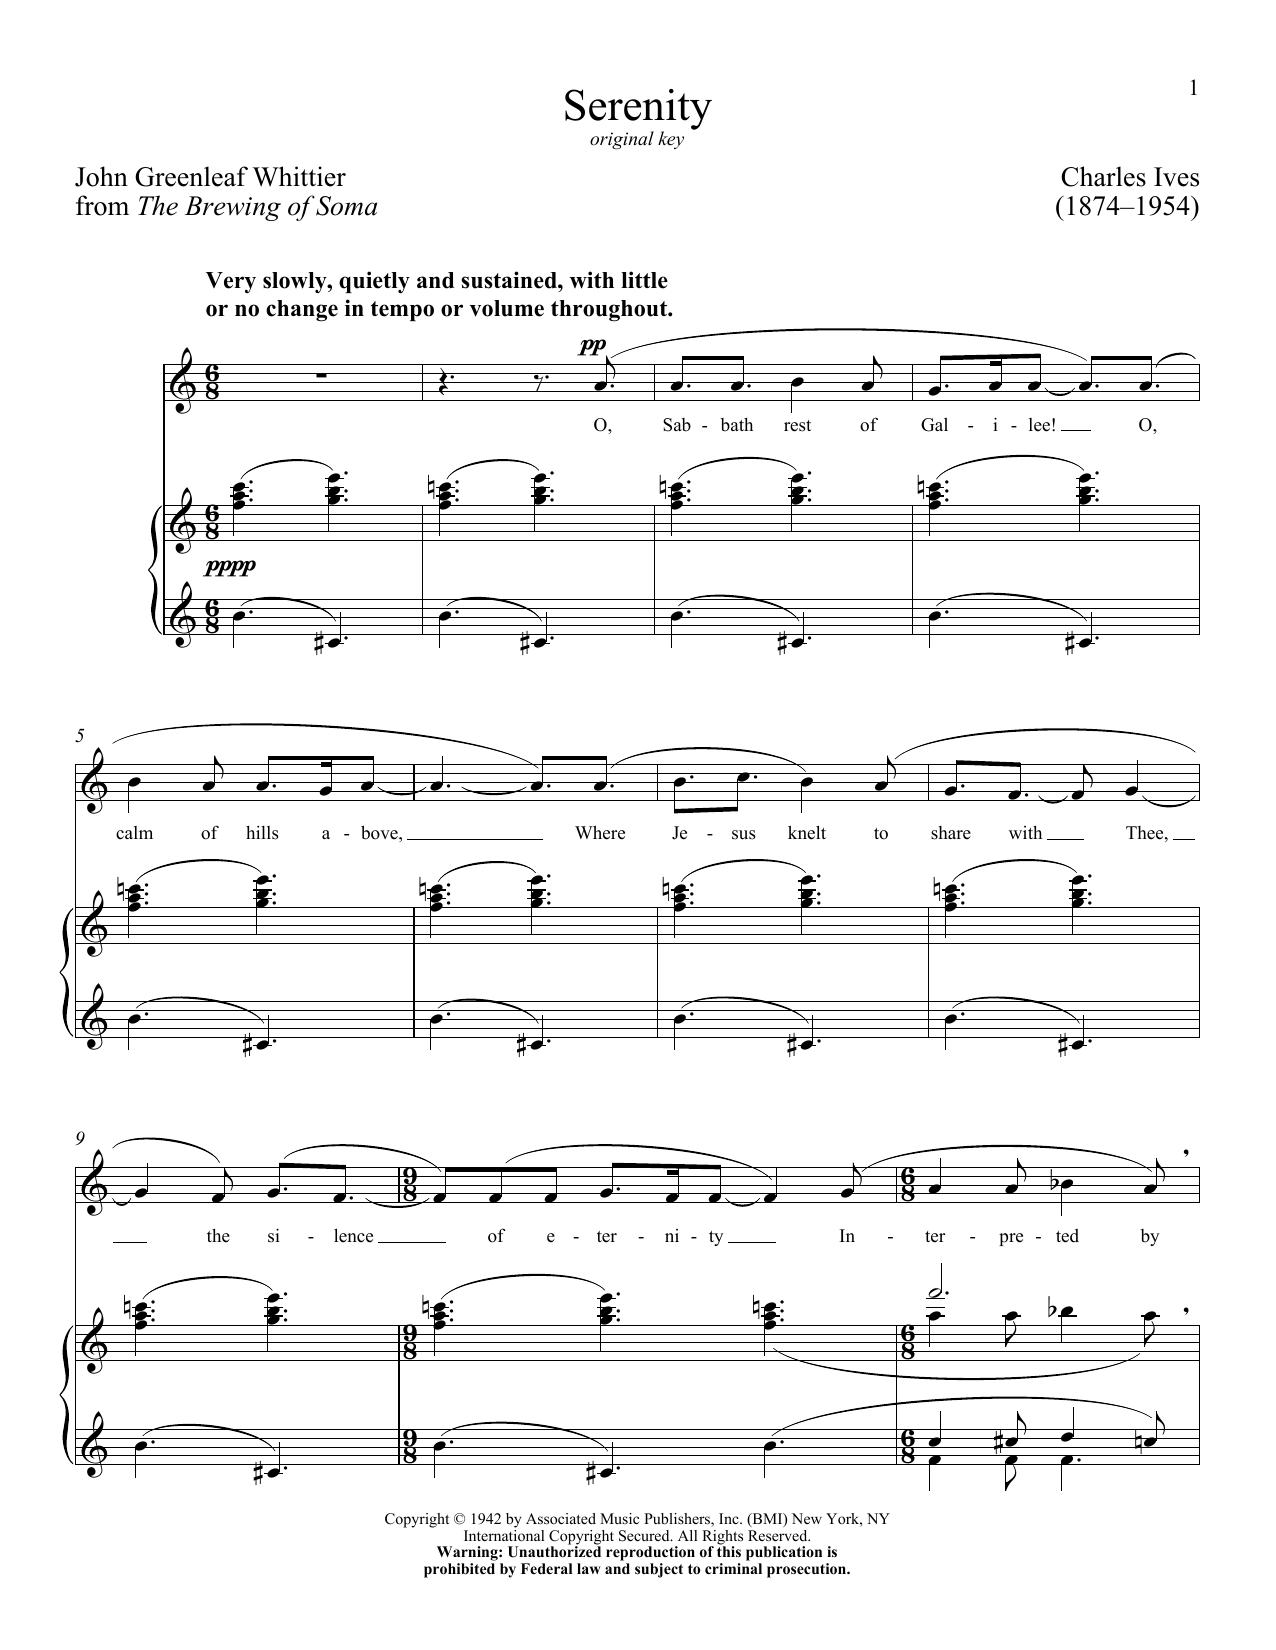 Charles Ives - Serenity